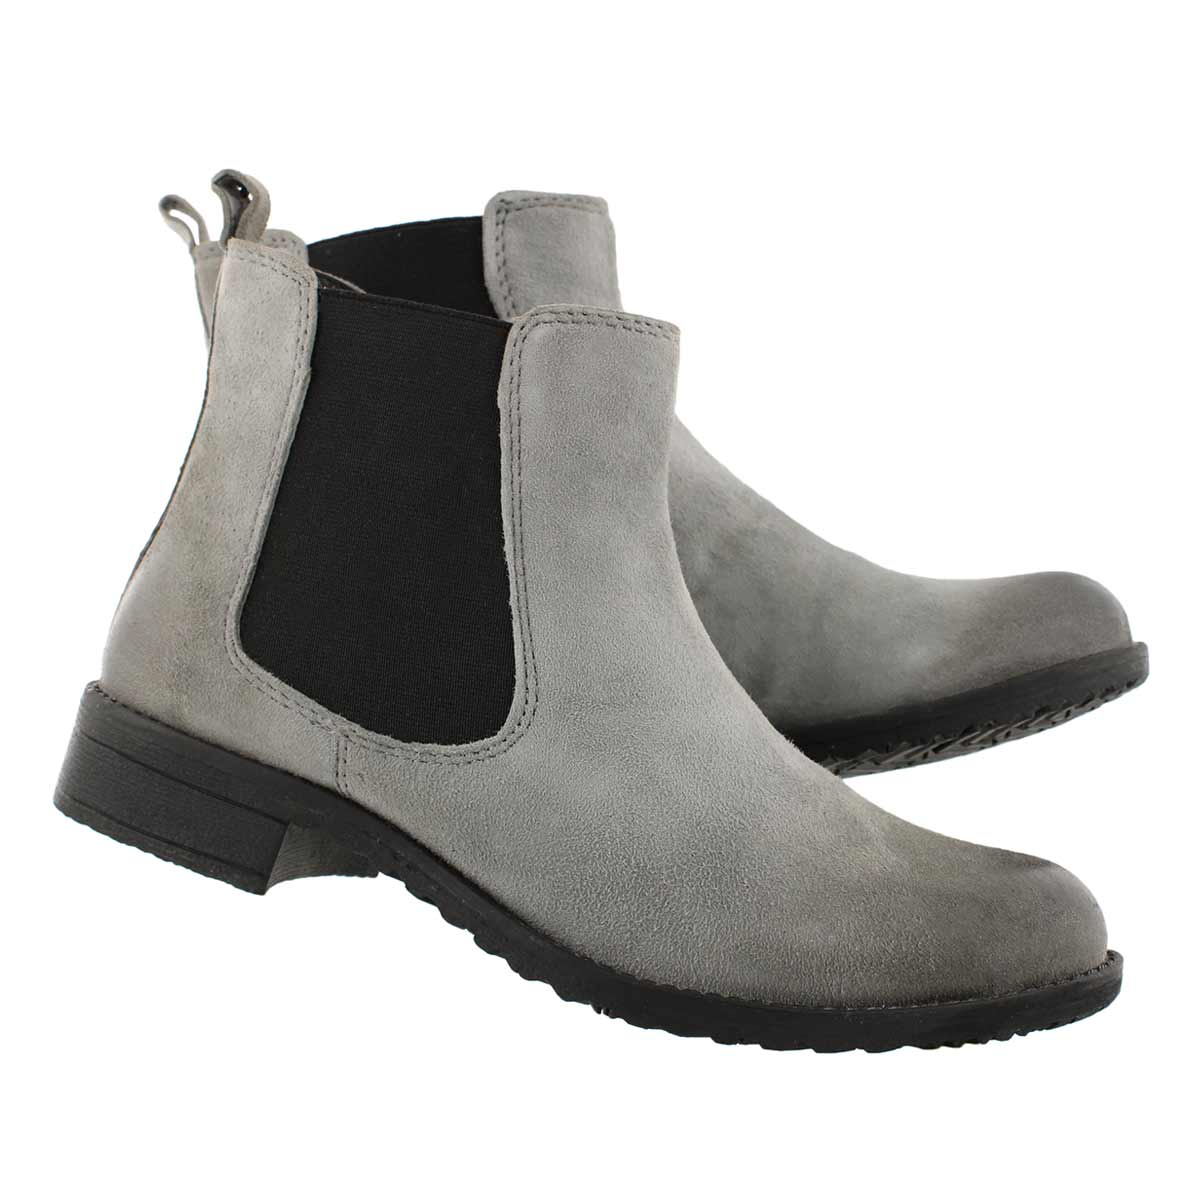 Lds Darilyn grey chelsea boot